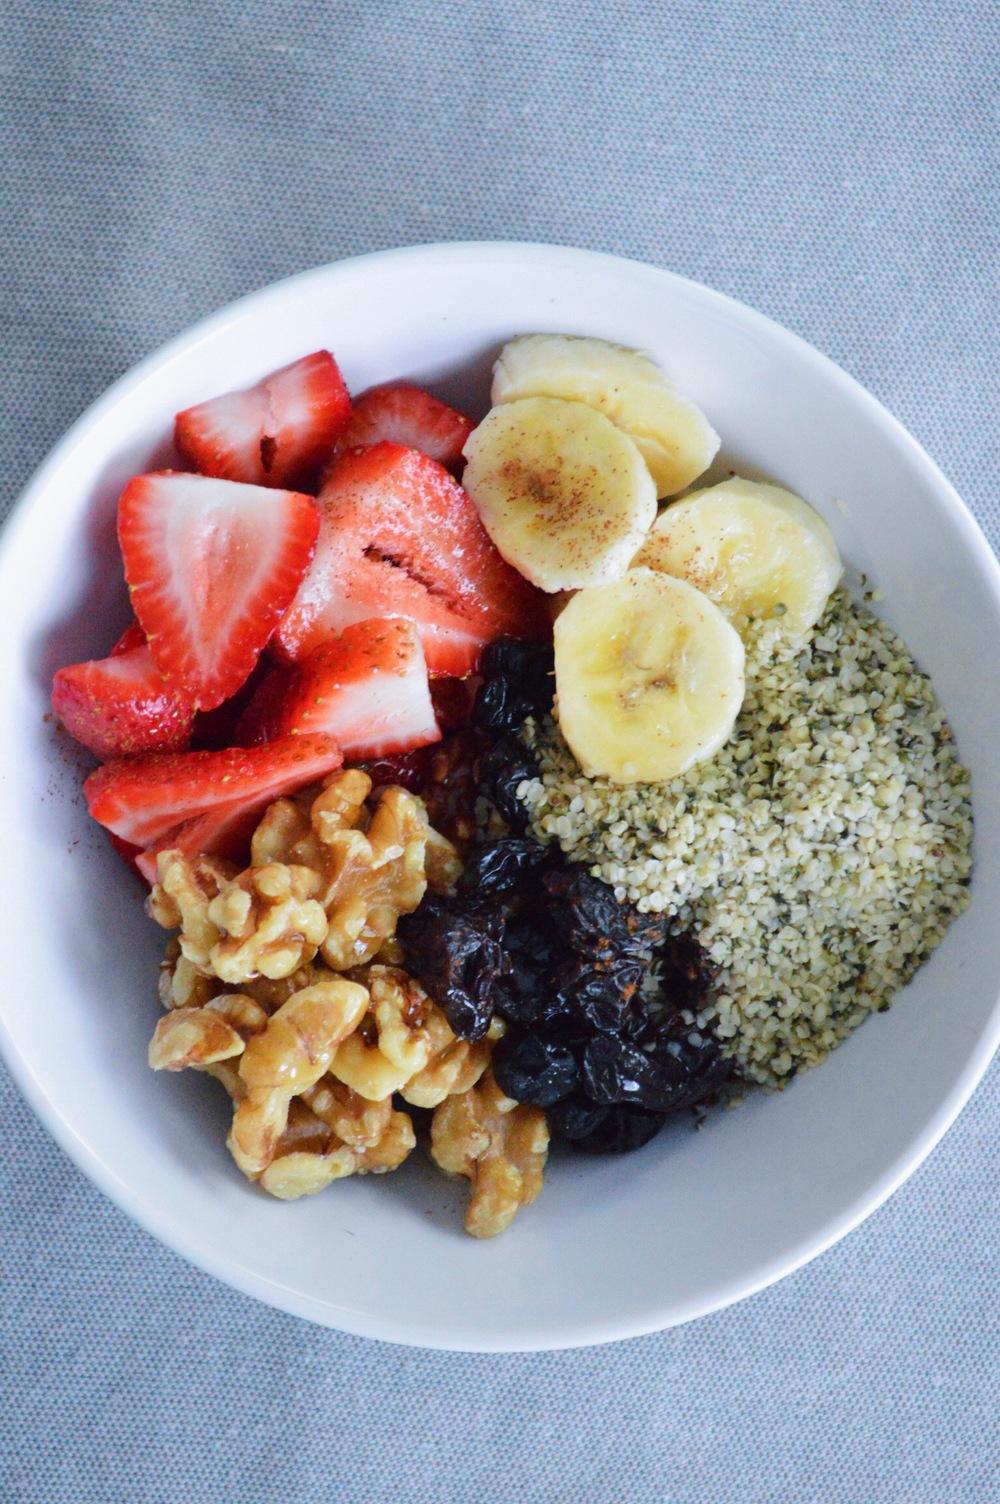 Fruit-Superfood-Bowl-LaurenSchwaiger-Blog.jpg